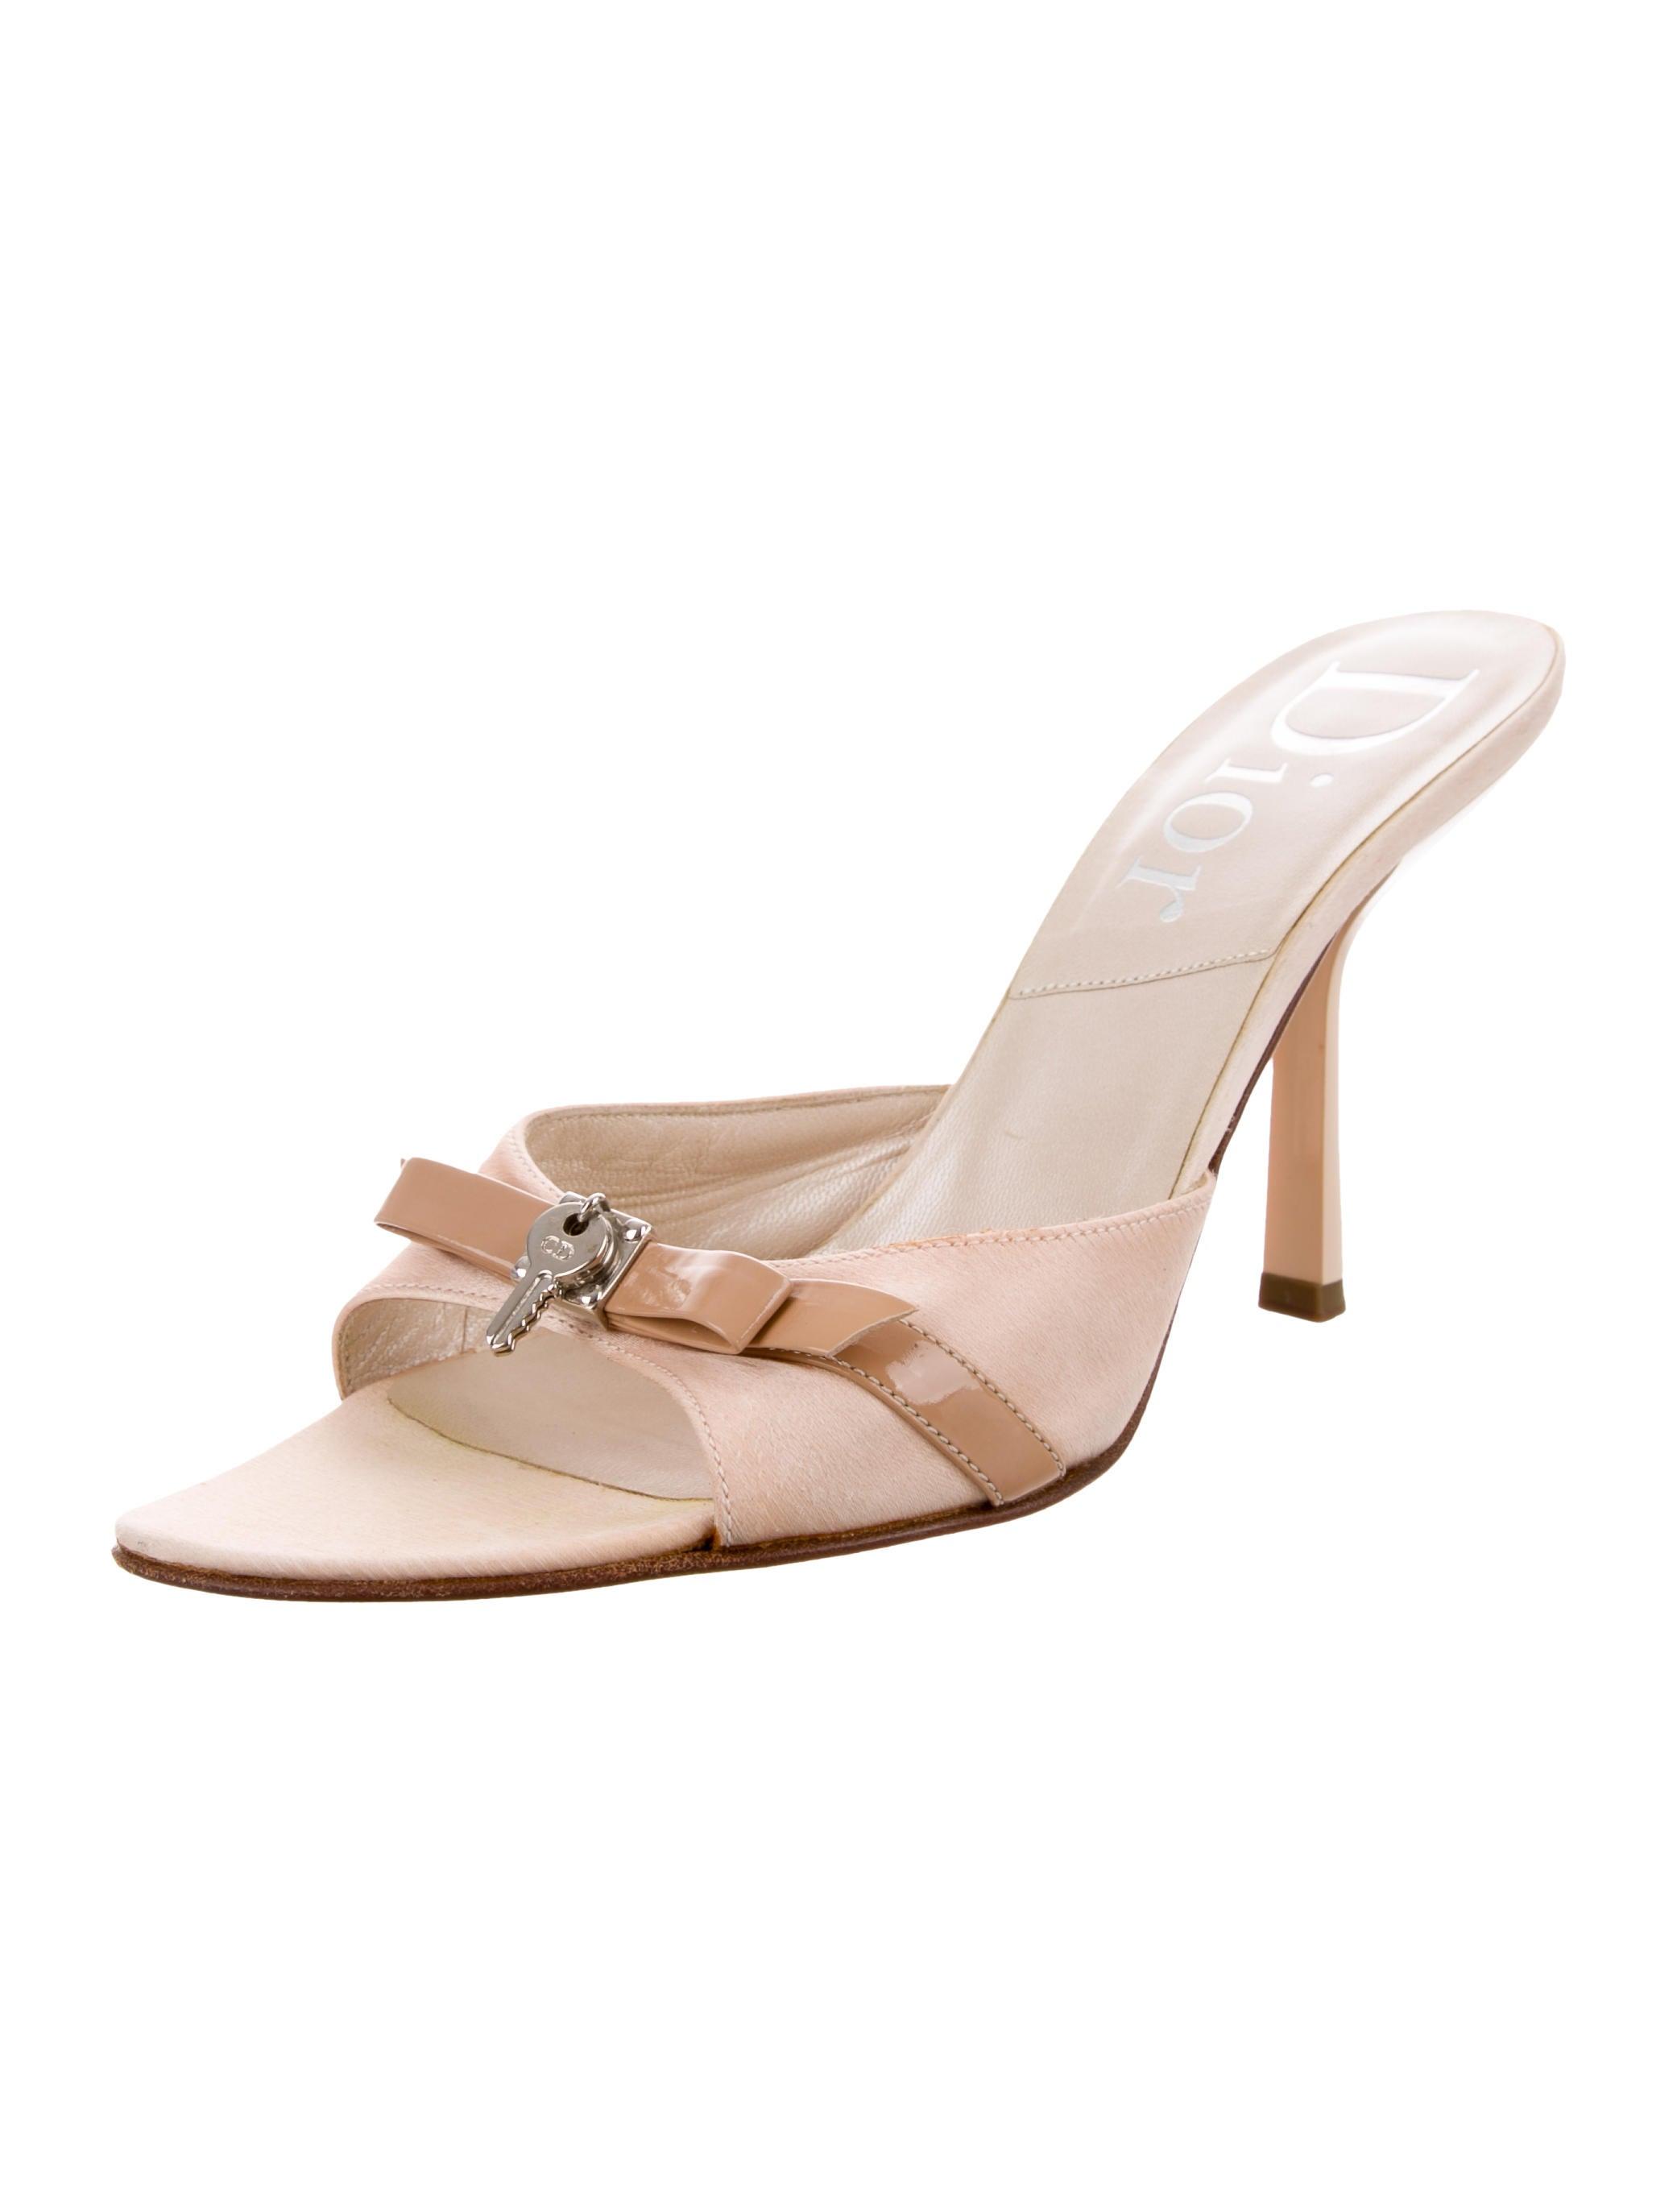 Christian Dior Satin Embellished Slide Sandals cheap largest supplier cheap sale 2014 TIG6Fb46Ag